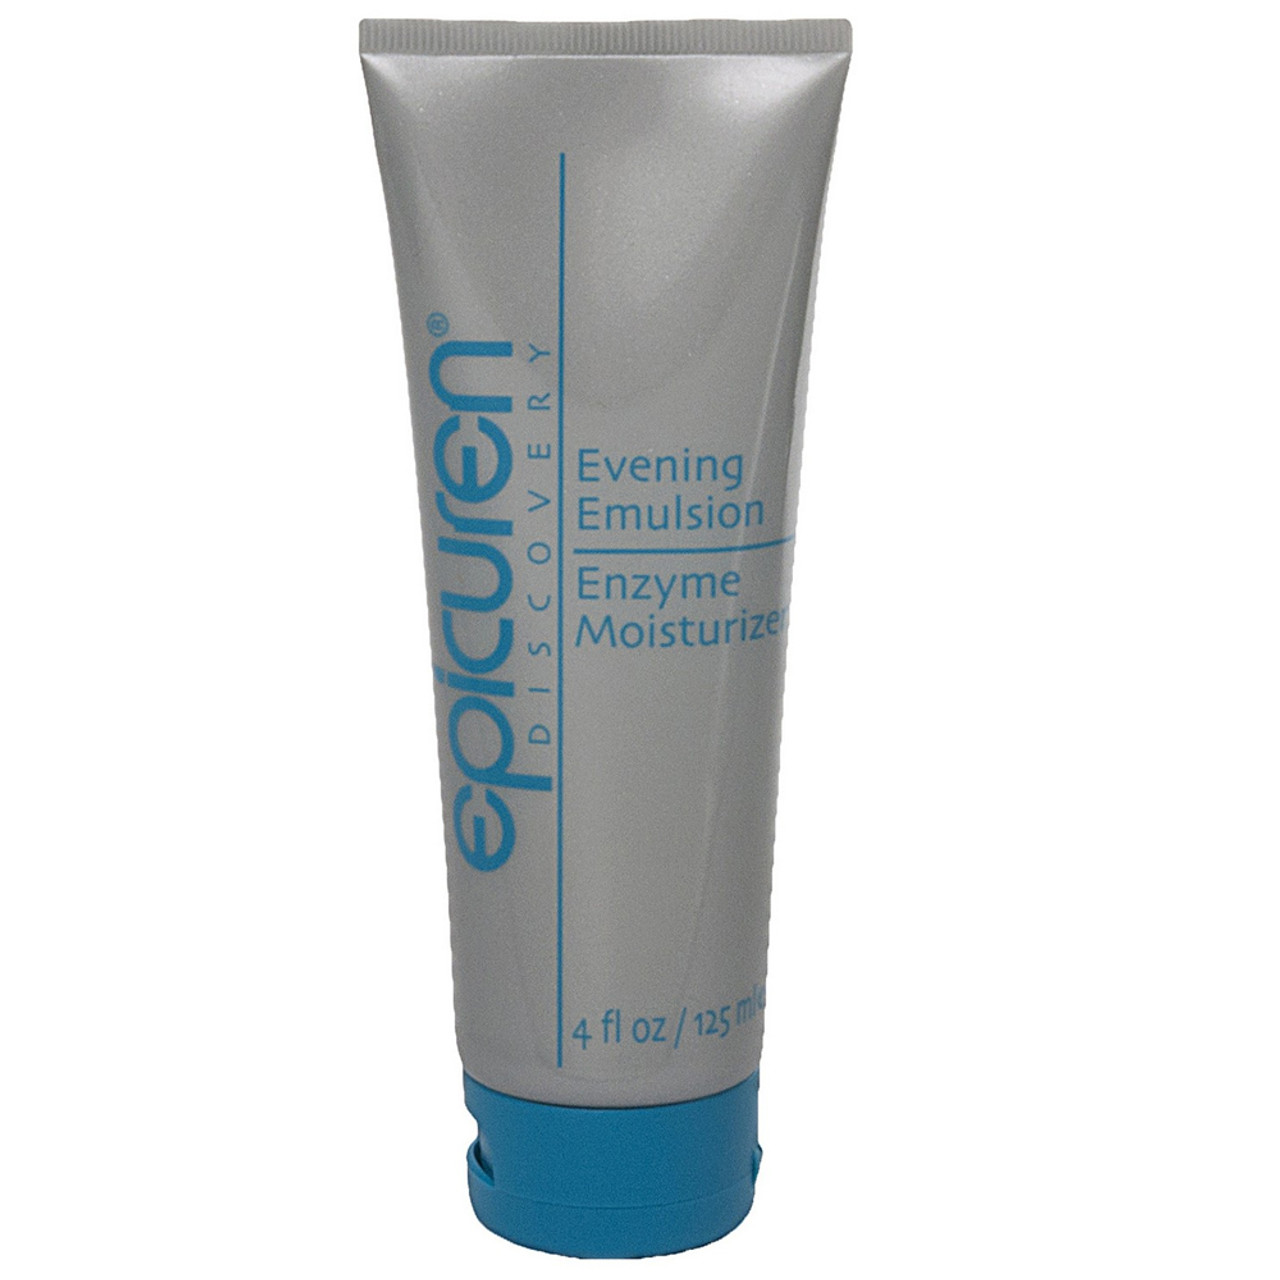 epicuren Discovery Evening Emulsion Enzyme Moisturizer 2.5 oz